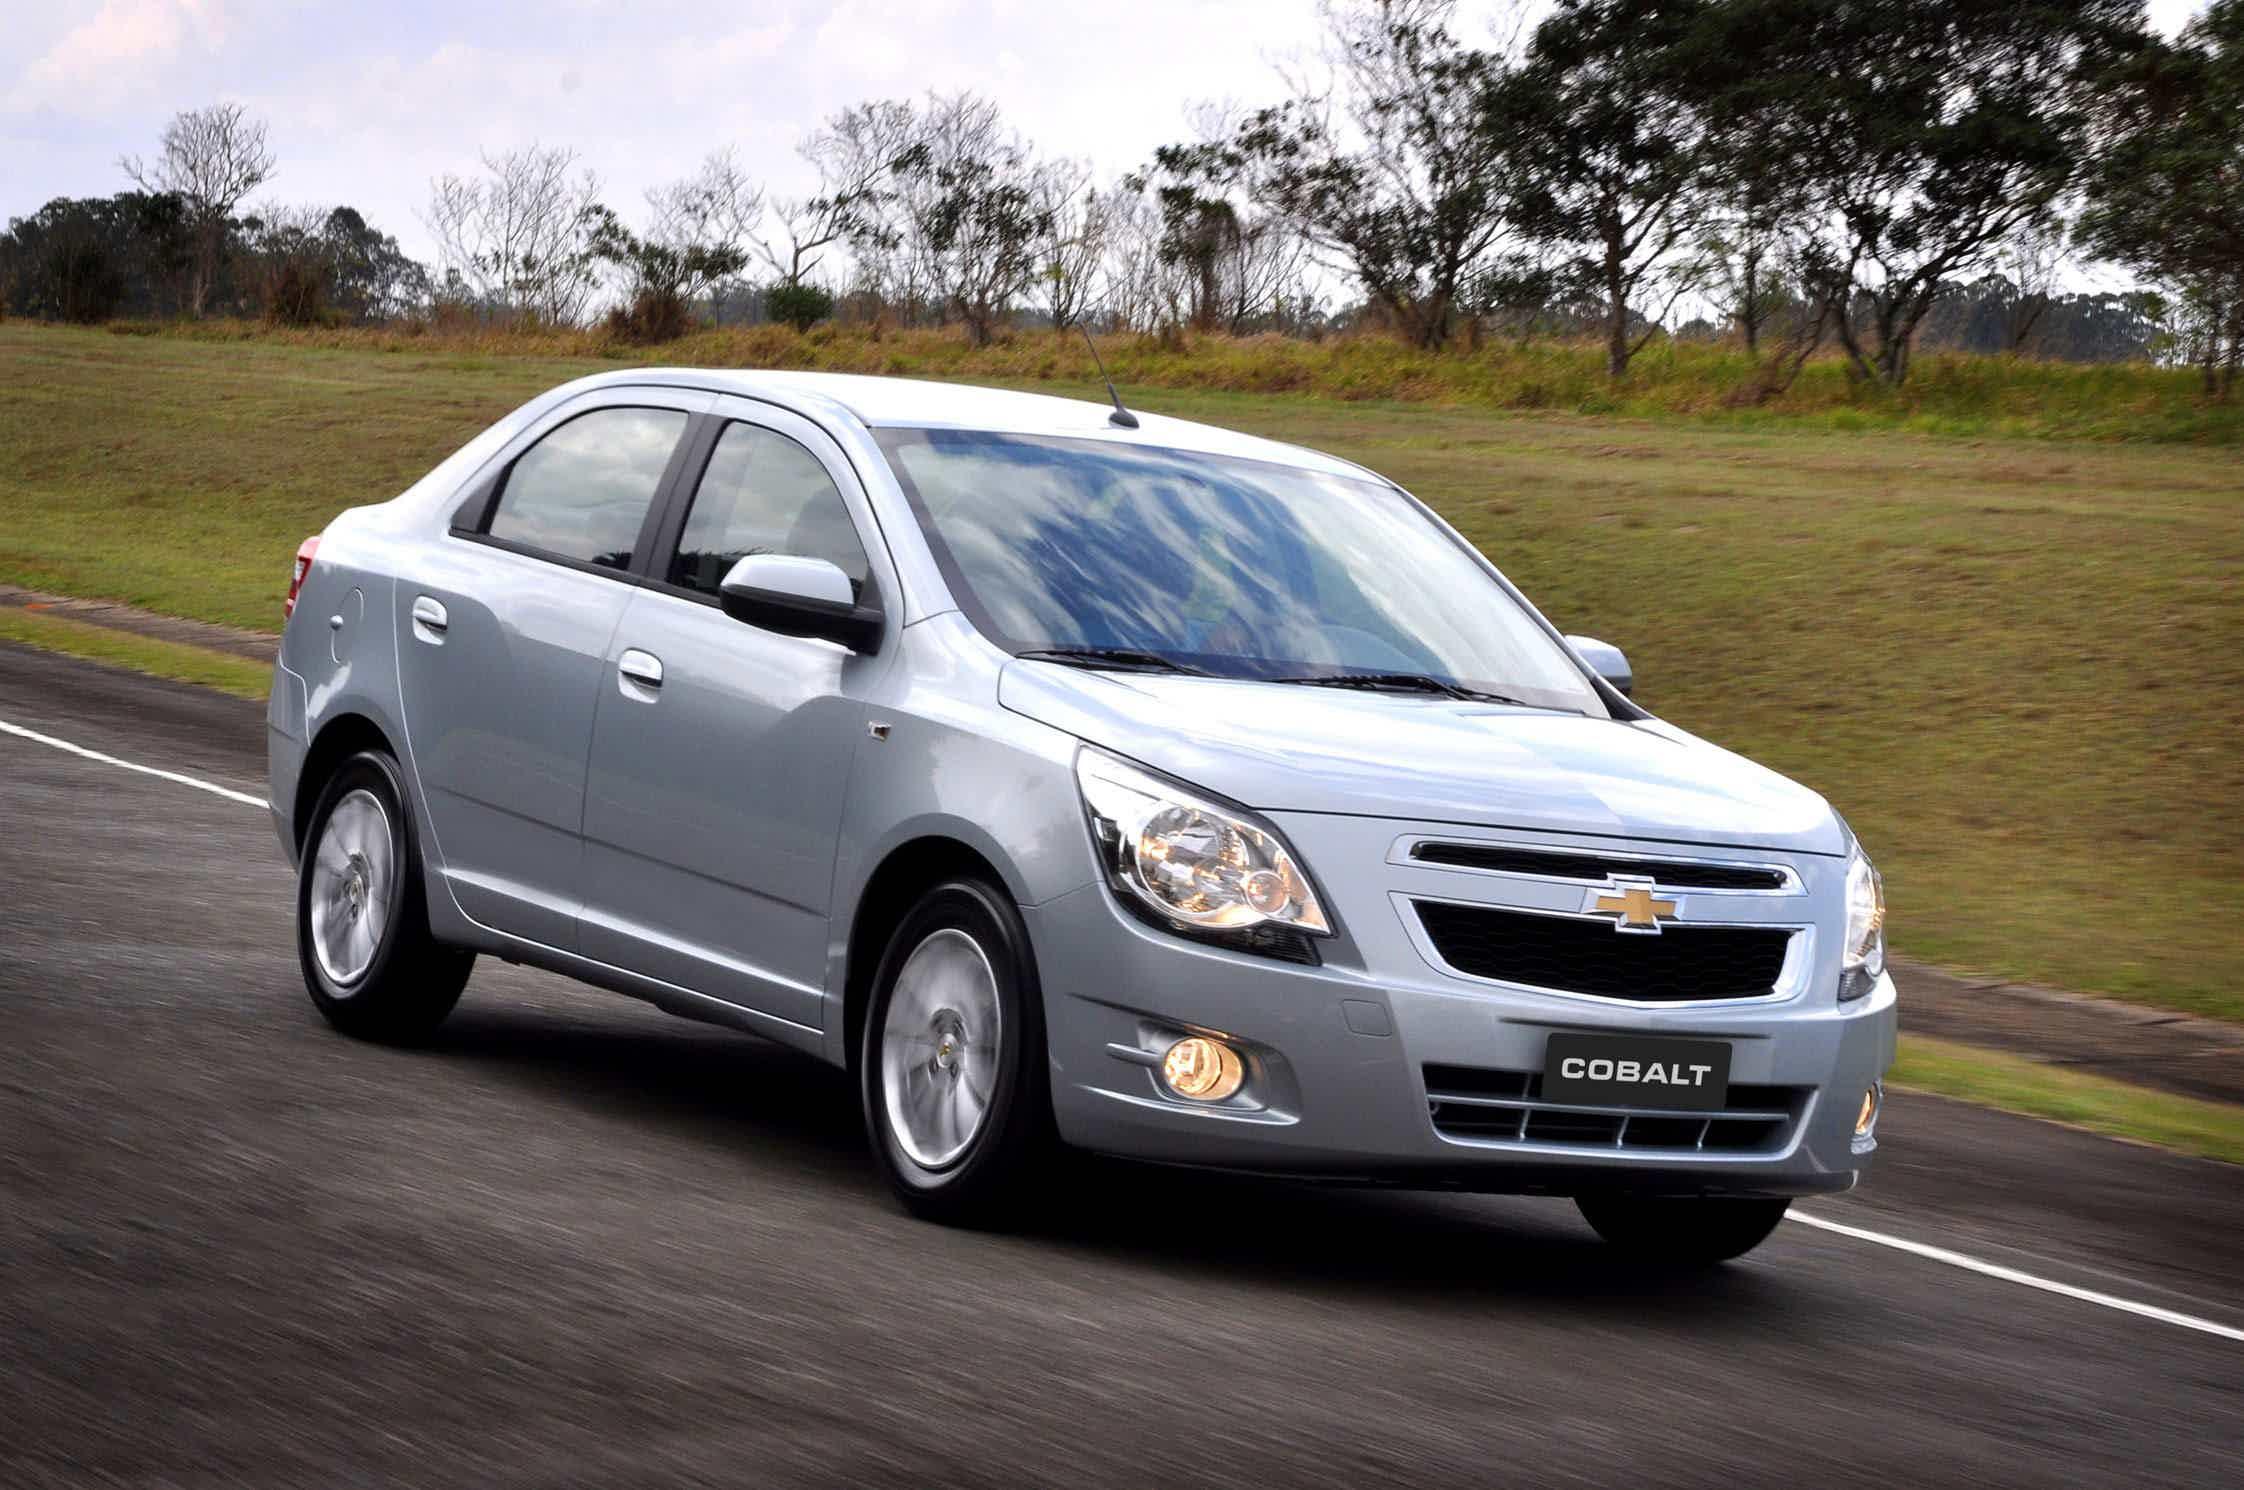 Chevrolet Cobalt 2012 LTZ 1.4